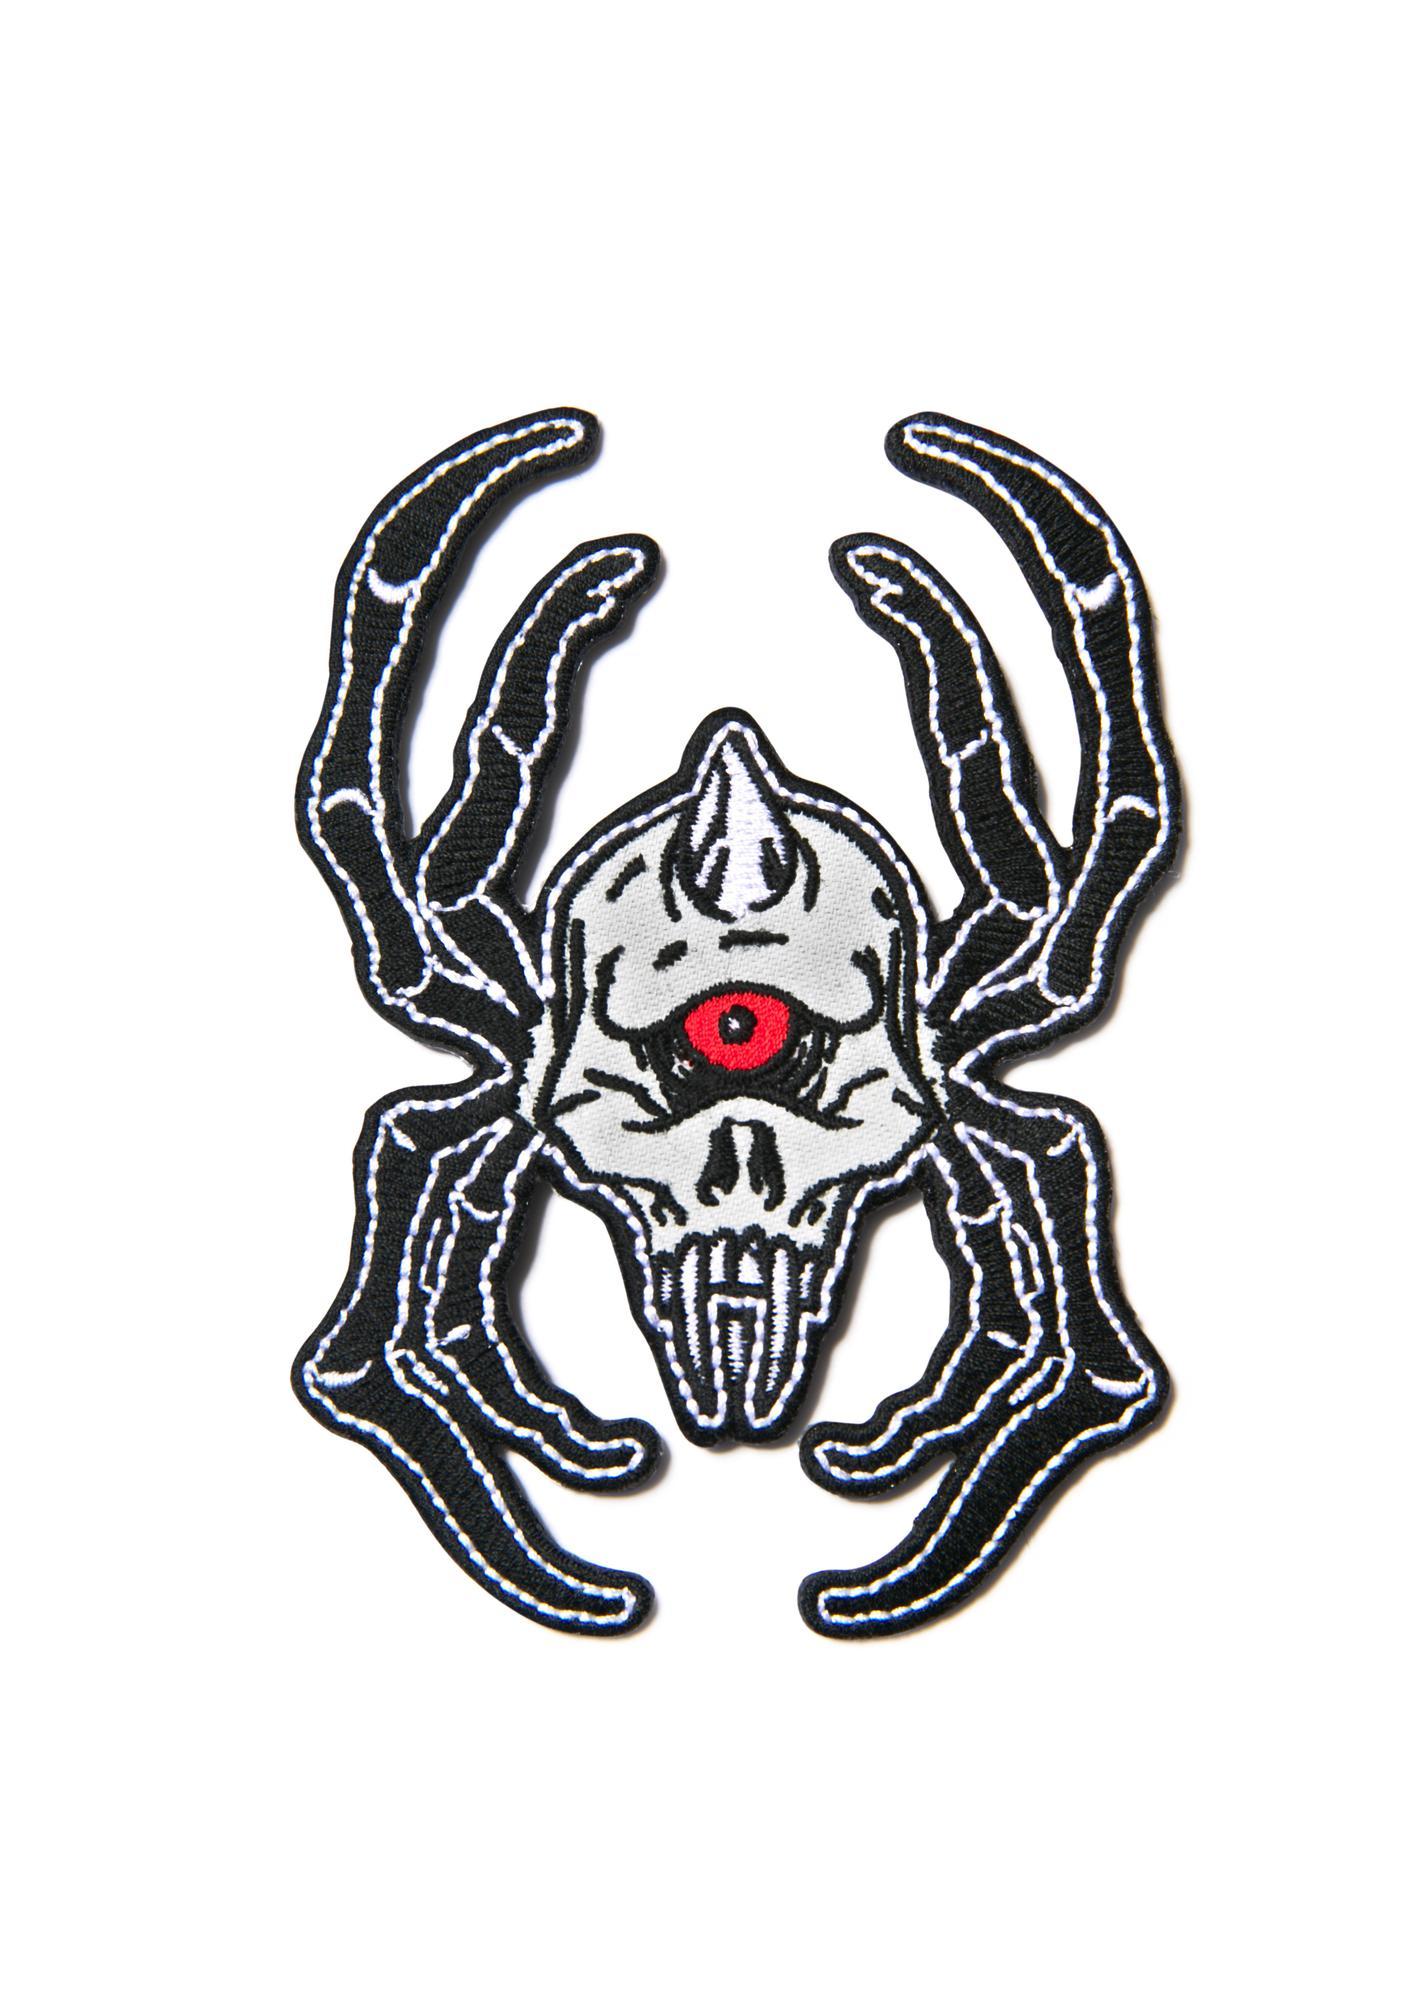 Mishka Cyco Spider Patch